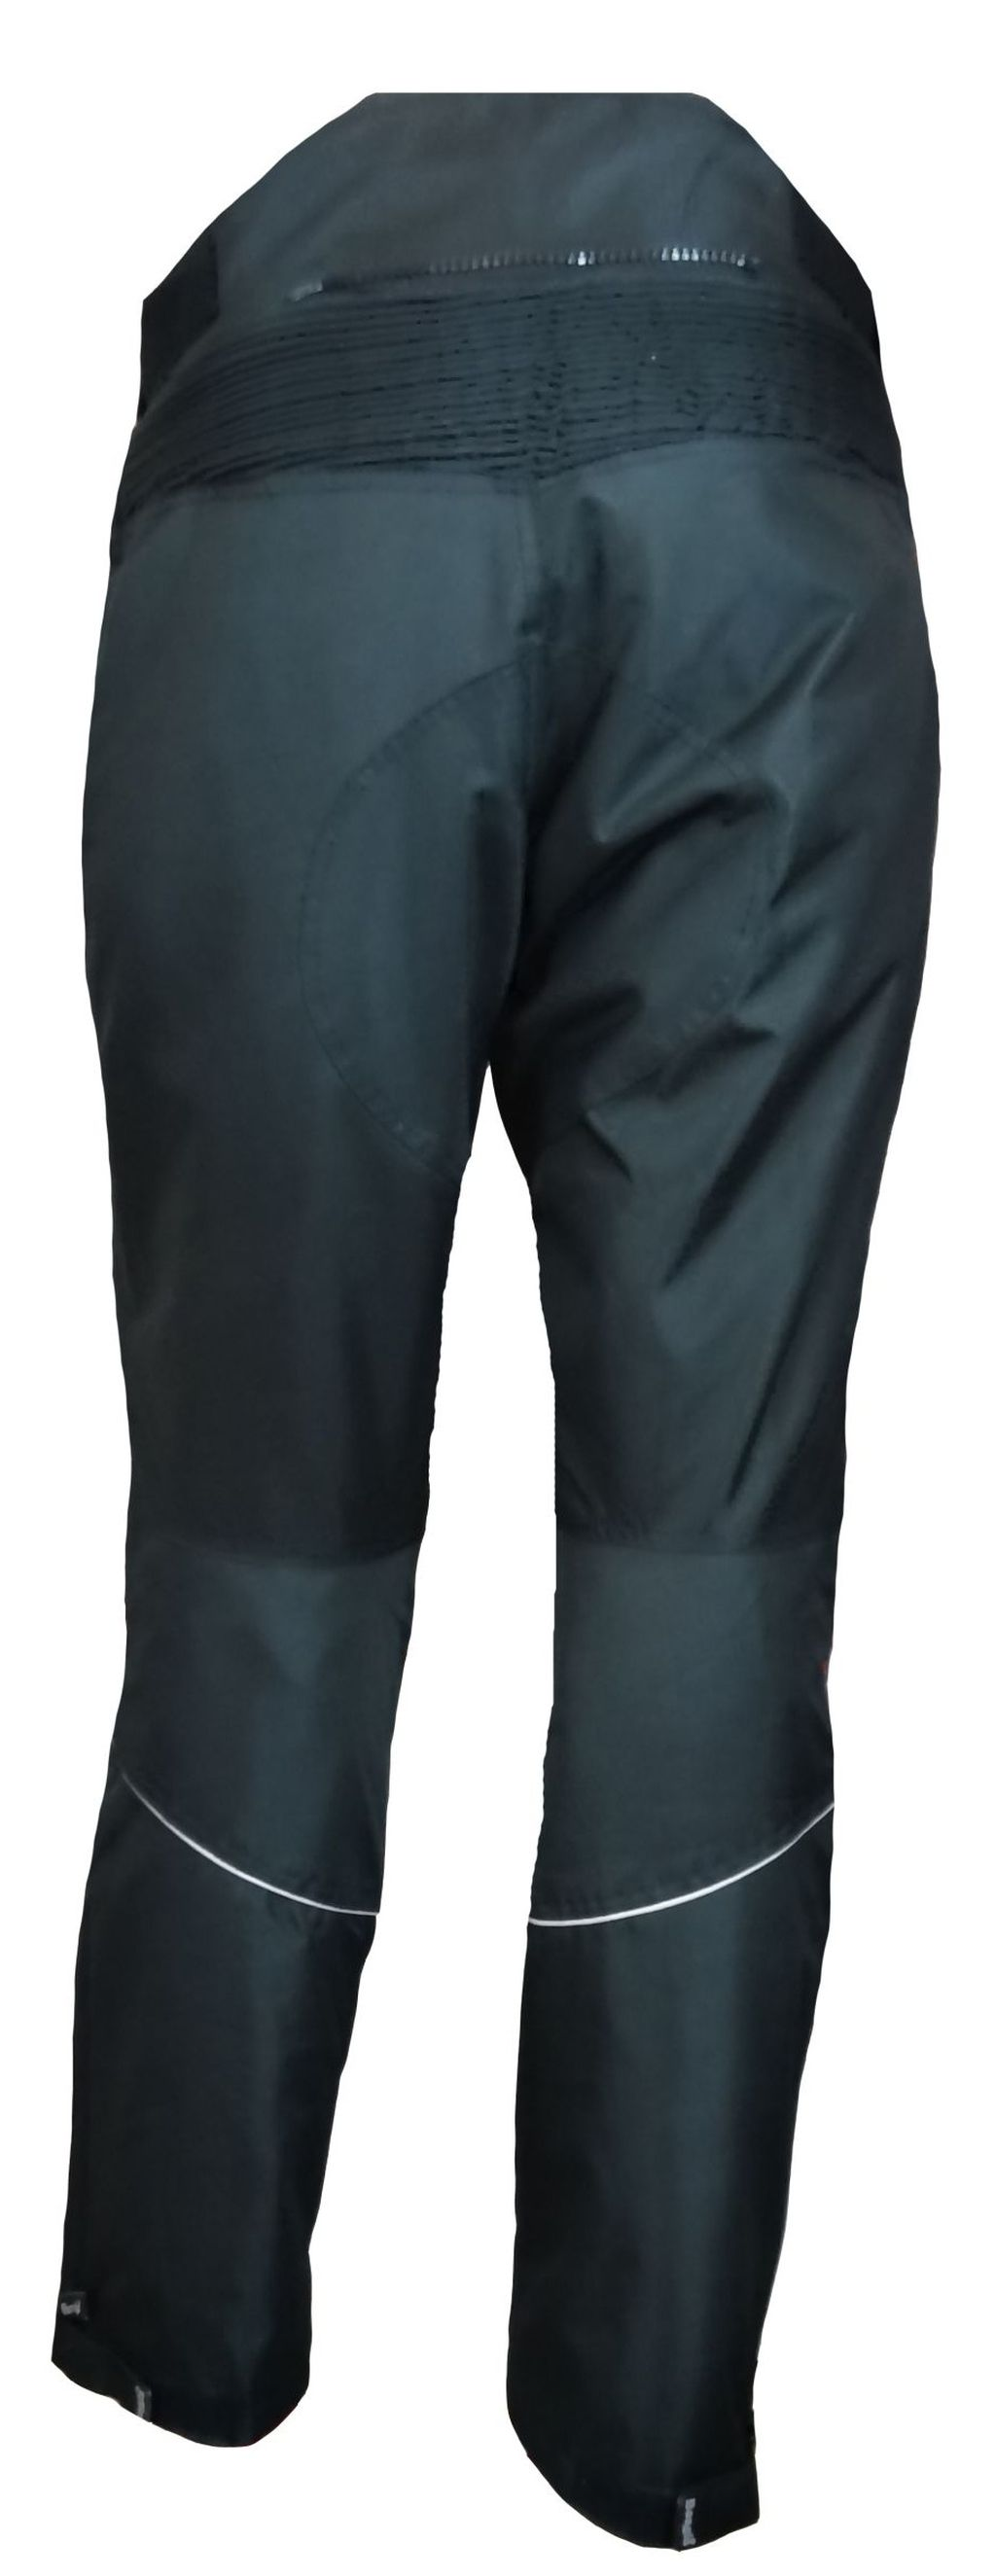 Bangla Motorrad Hose Motorradhose Textil Cordura schwarz grau weiss S - 6 XL